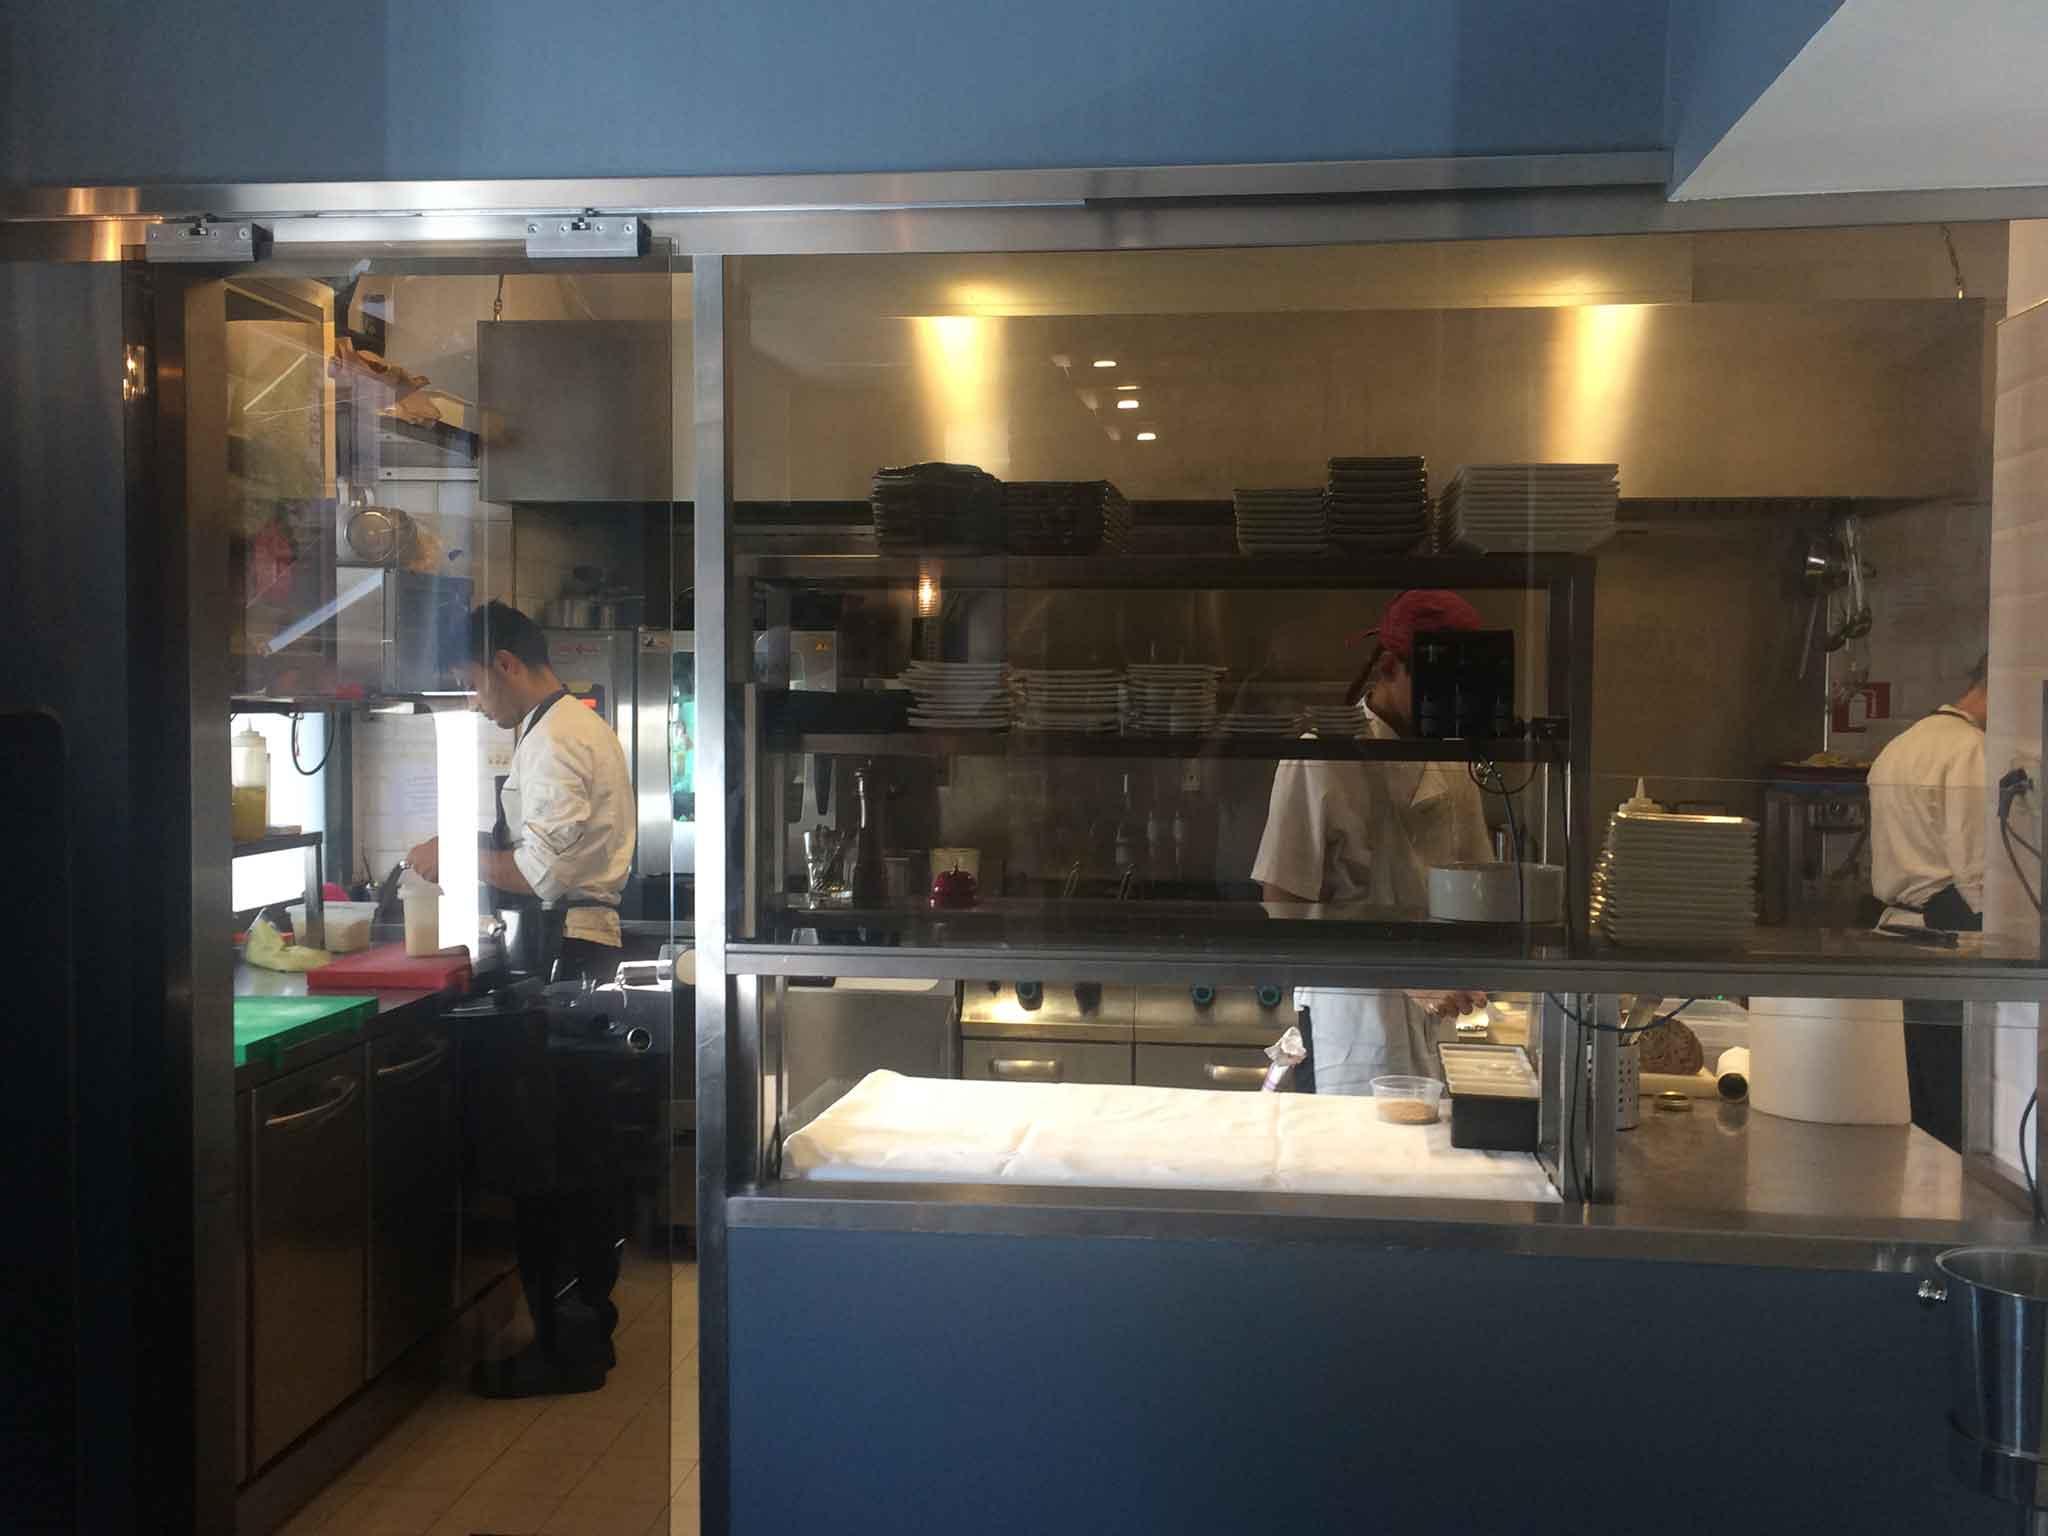 Cucine Liberty. Cheap Arredare Cucine Bologna With Cucine Liberty ...